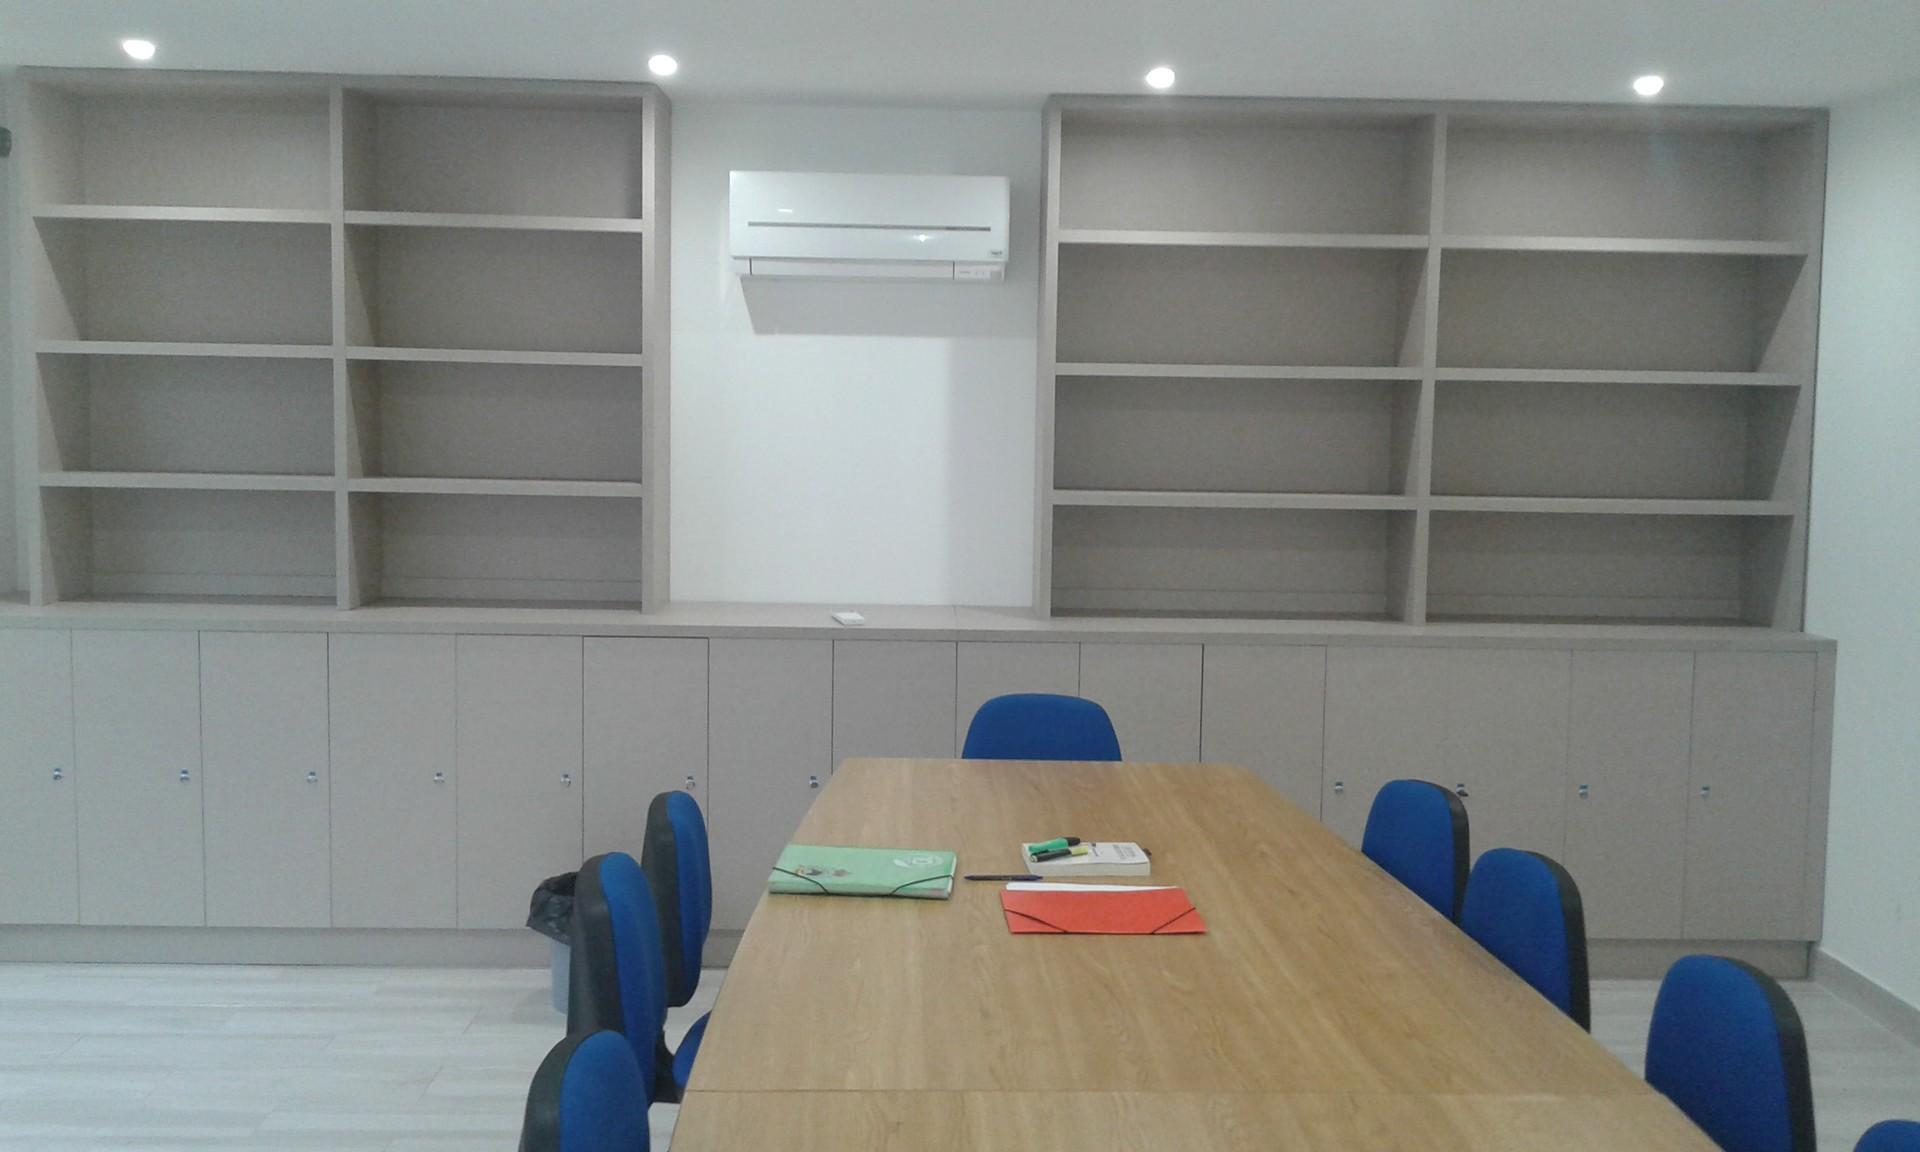 university-residency-cad11fb7d861cd31178